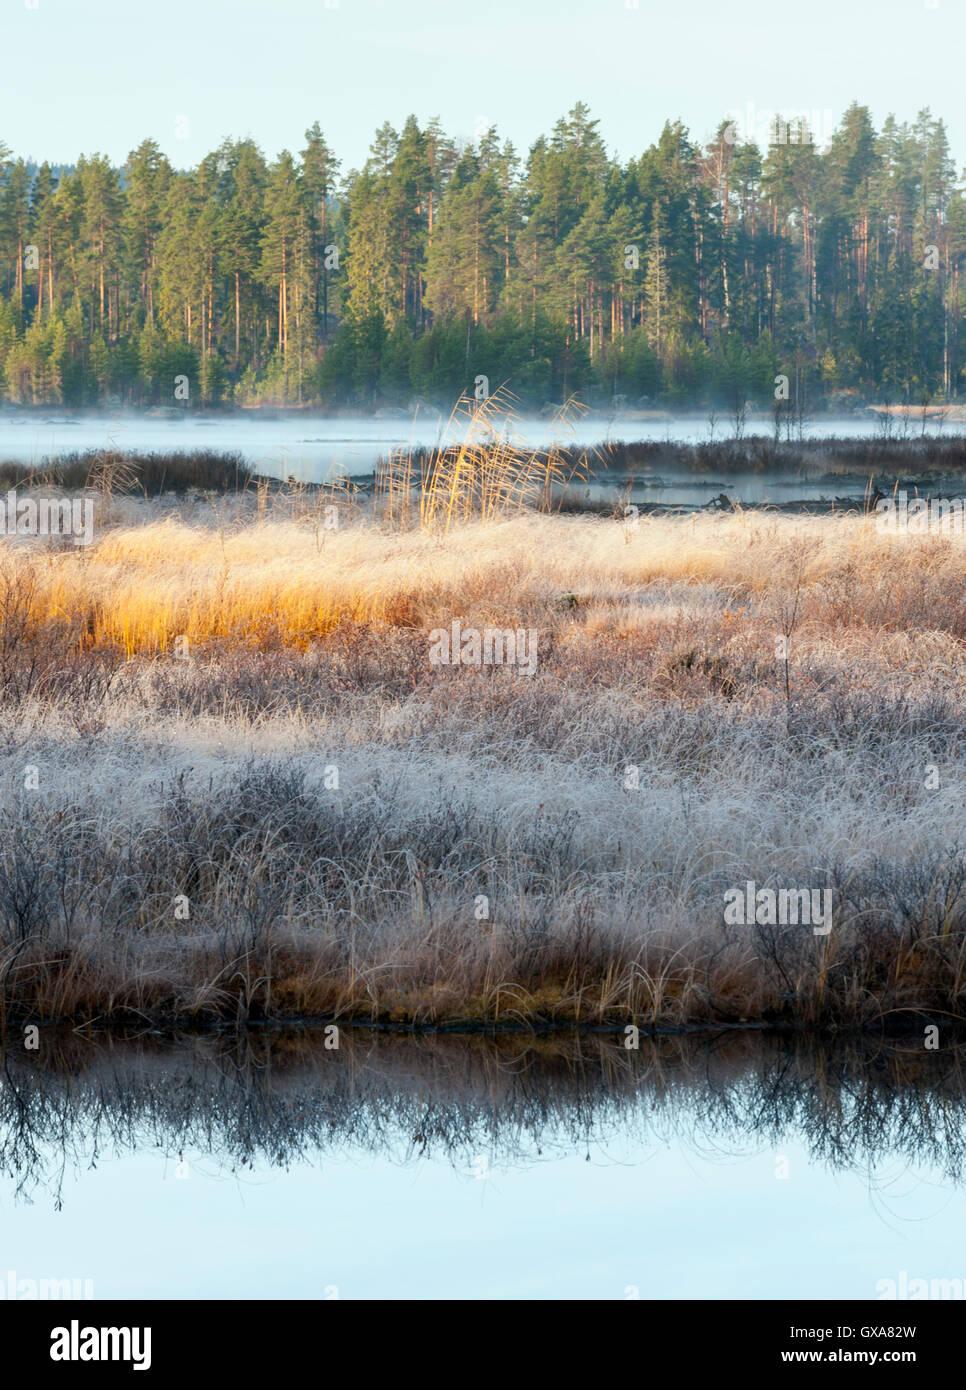 Frost in the wetlands, Sweden - Stock Image